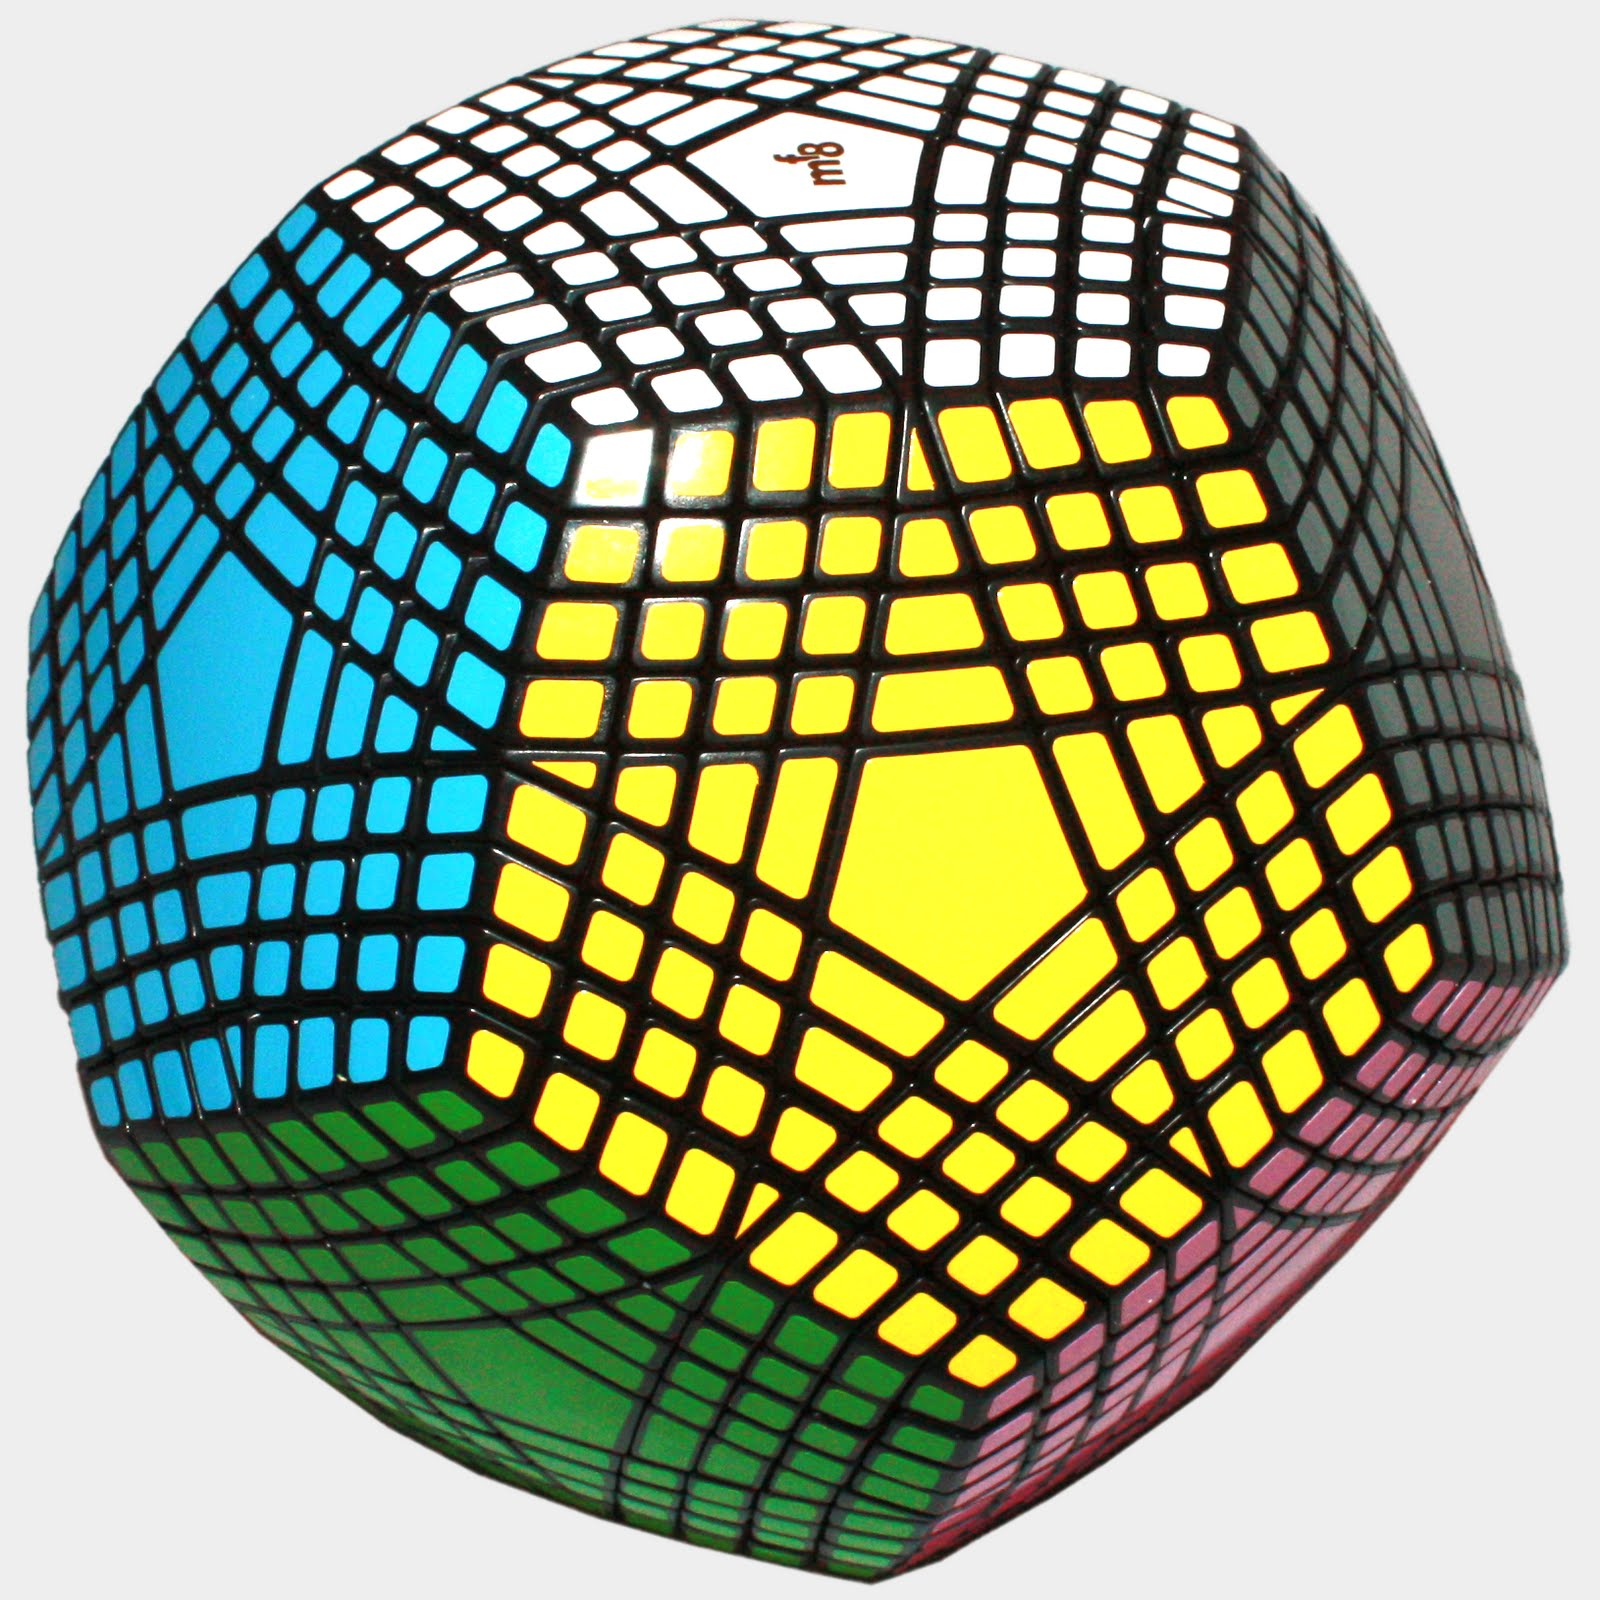 Twistypuzzles Com Forum View Topic Petaminx Mf8 Now